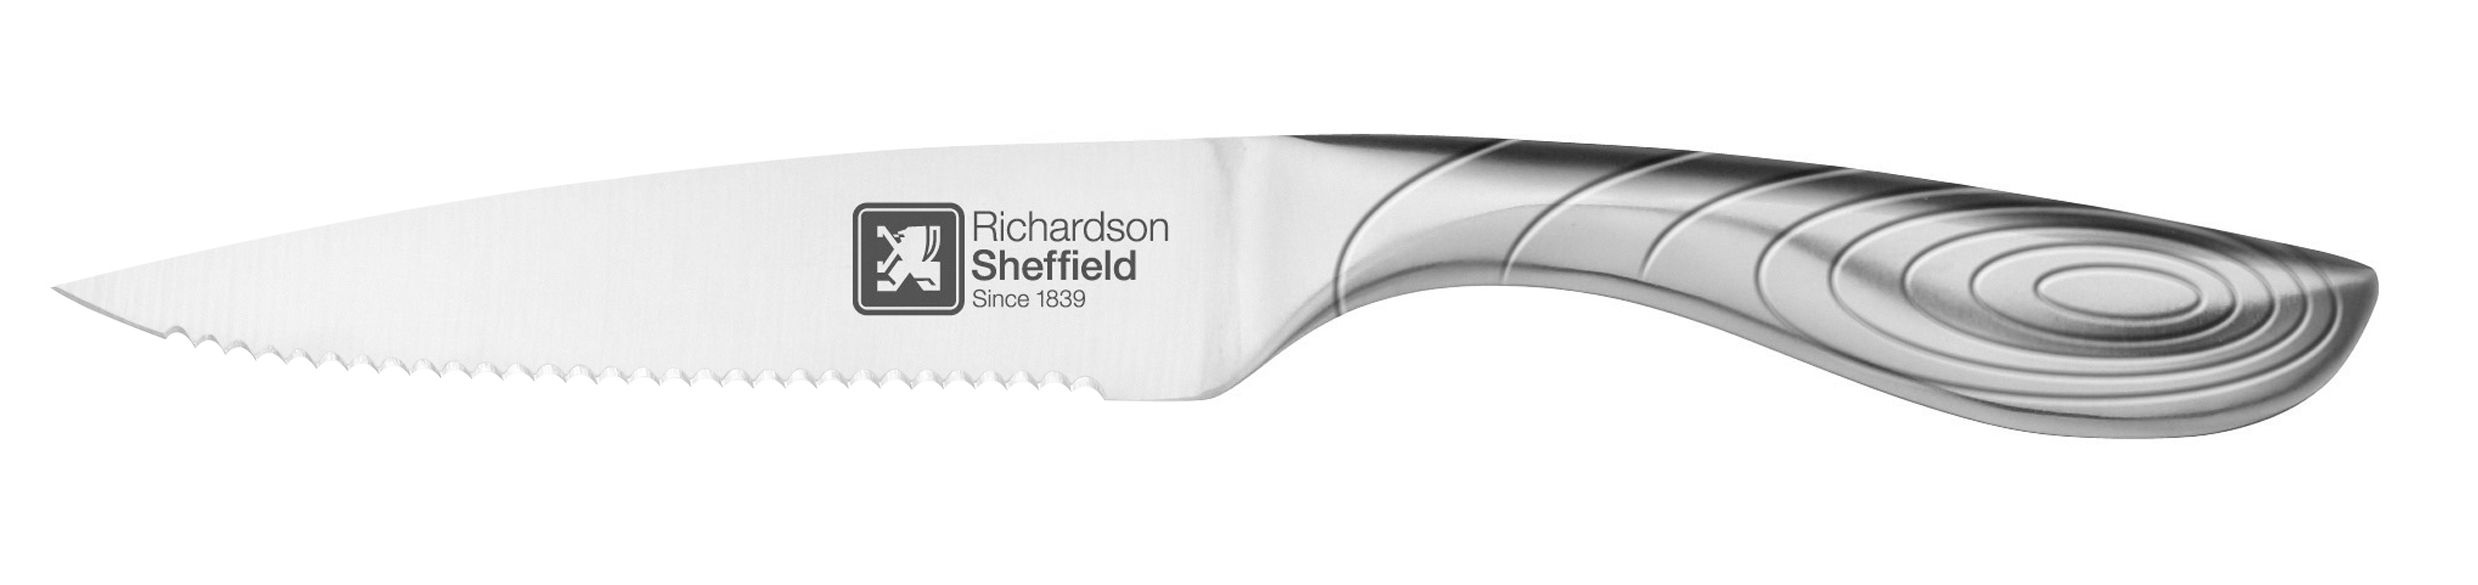 richard_sheffield_officemes_forme_contours_11.5_cm.jpg